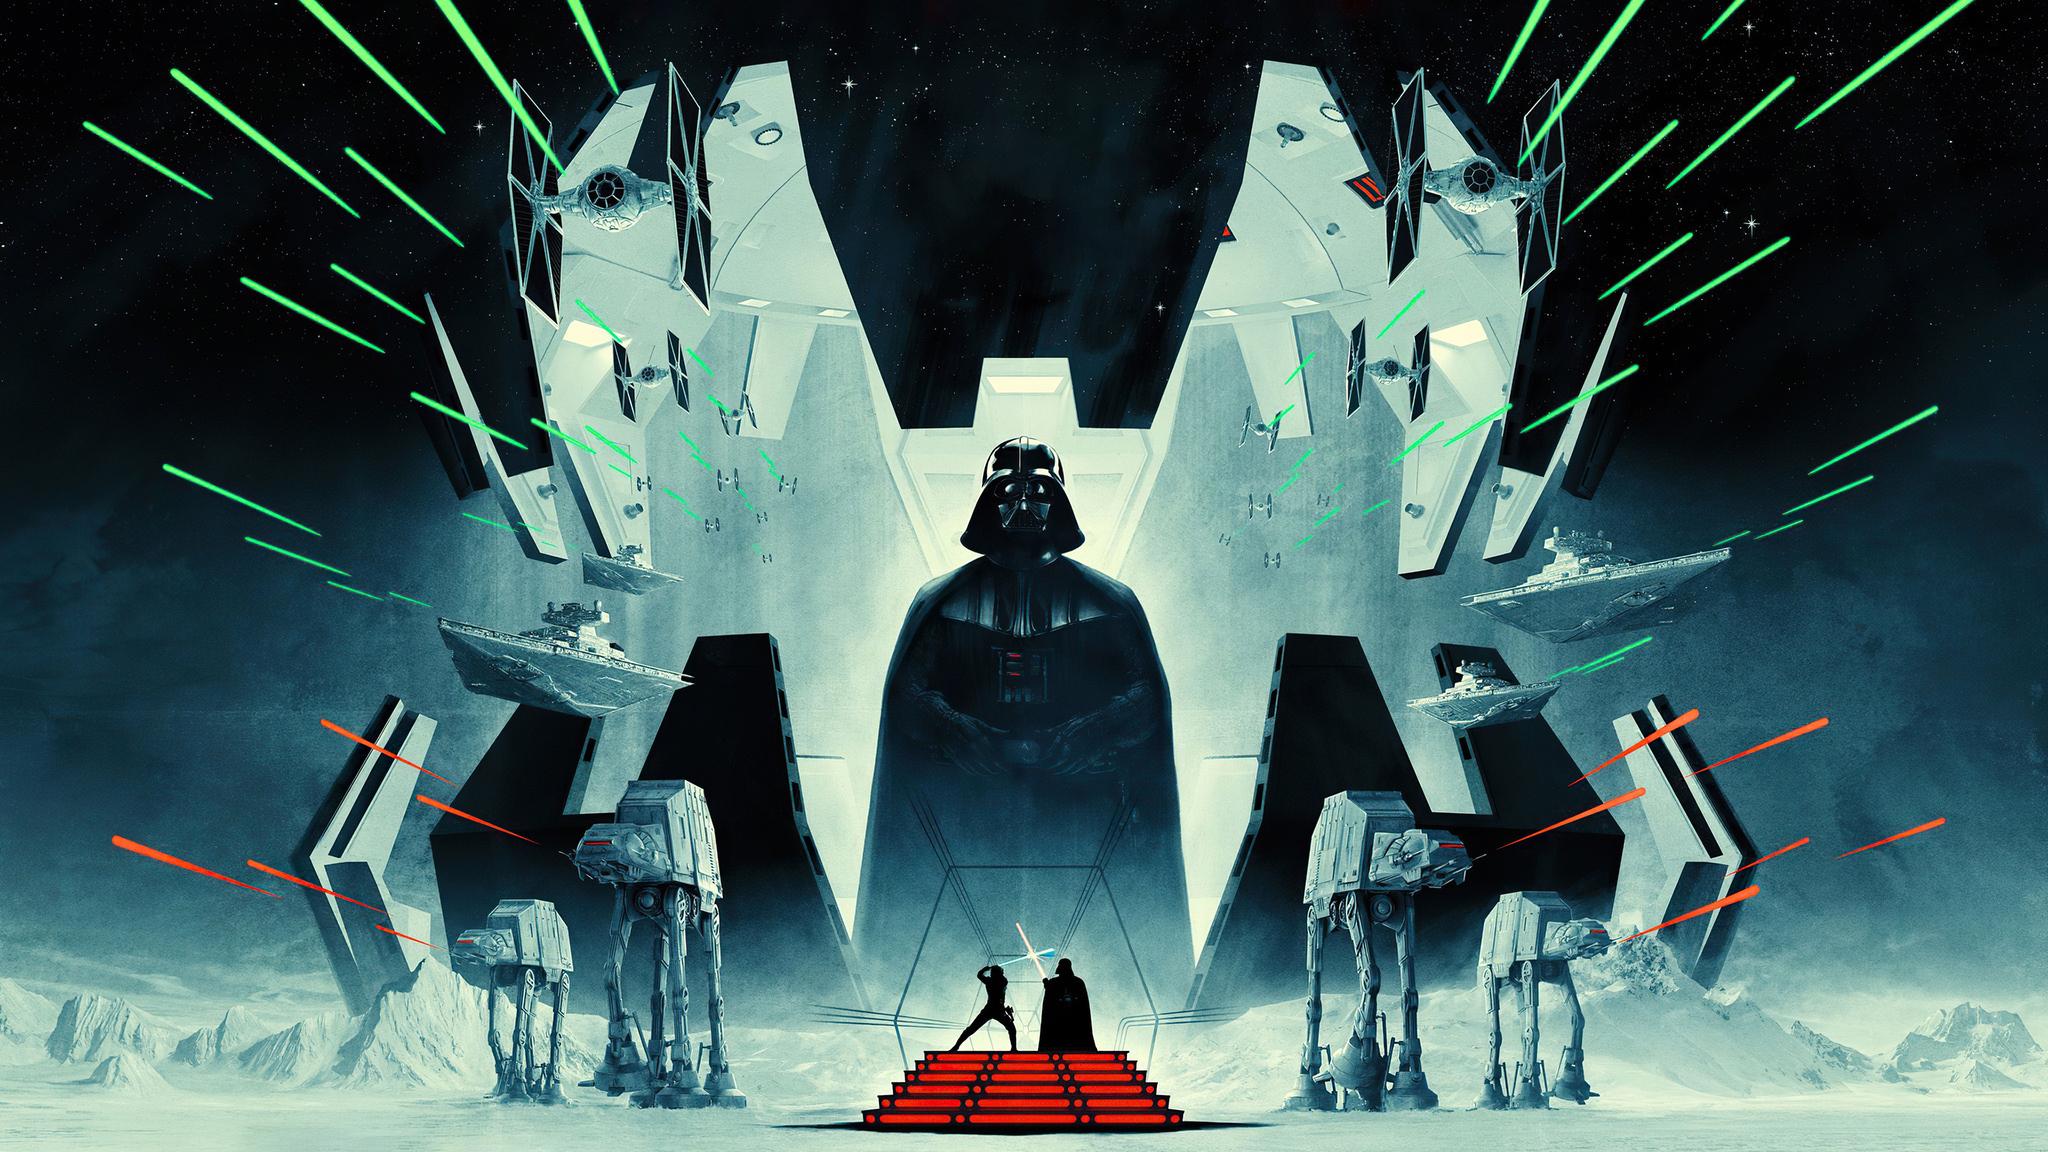 star-wars-empire-strikes-back-ie.jpg